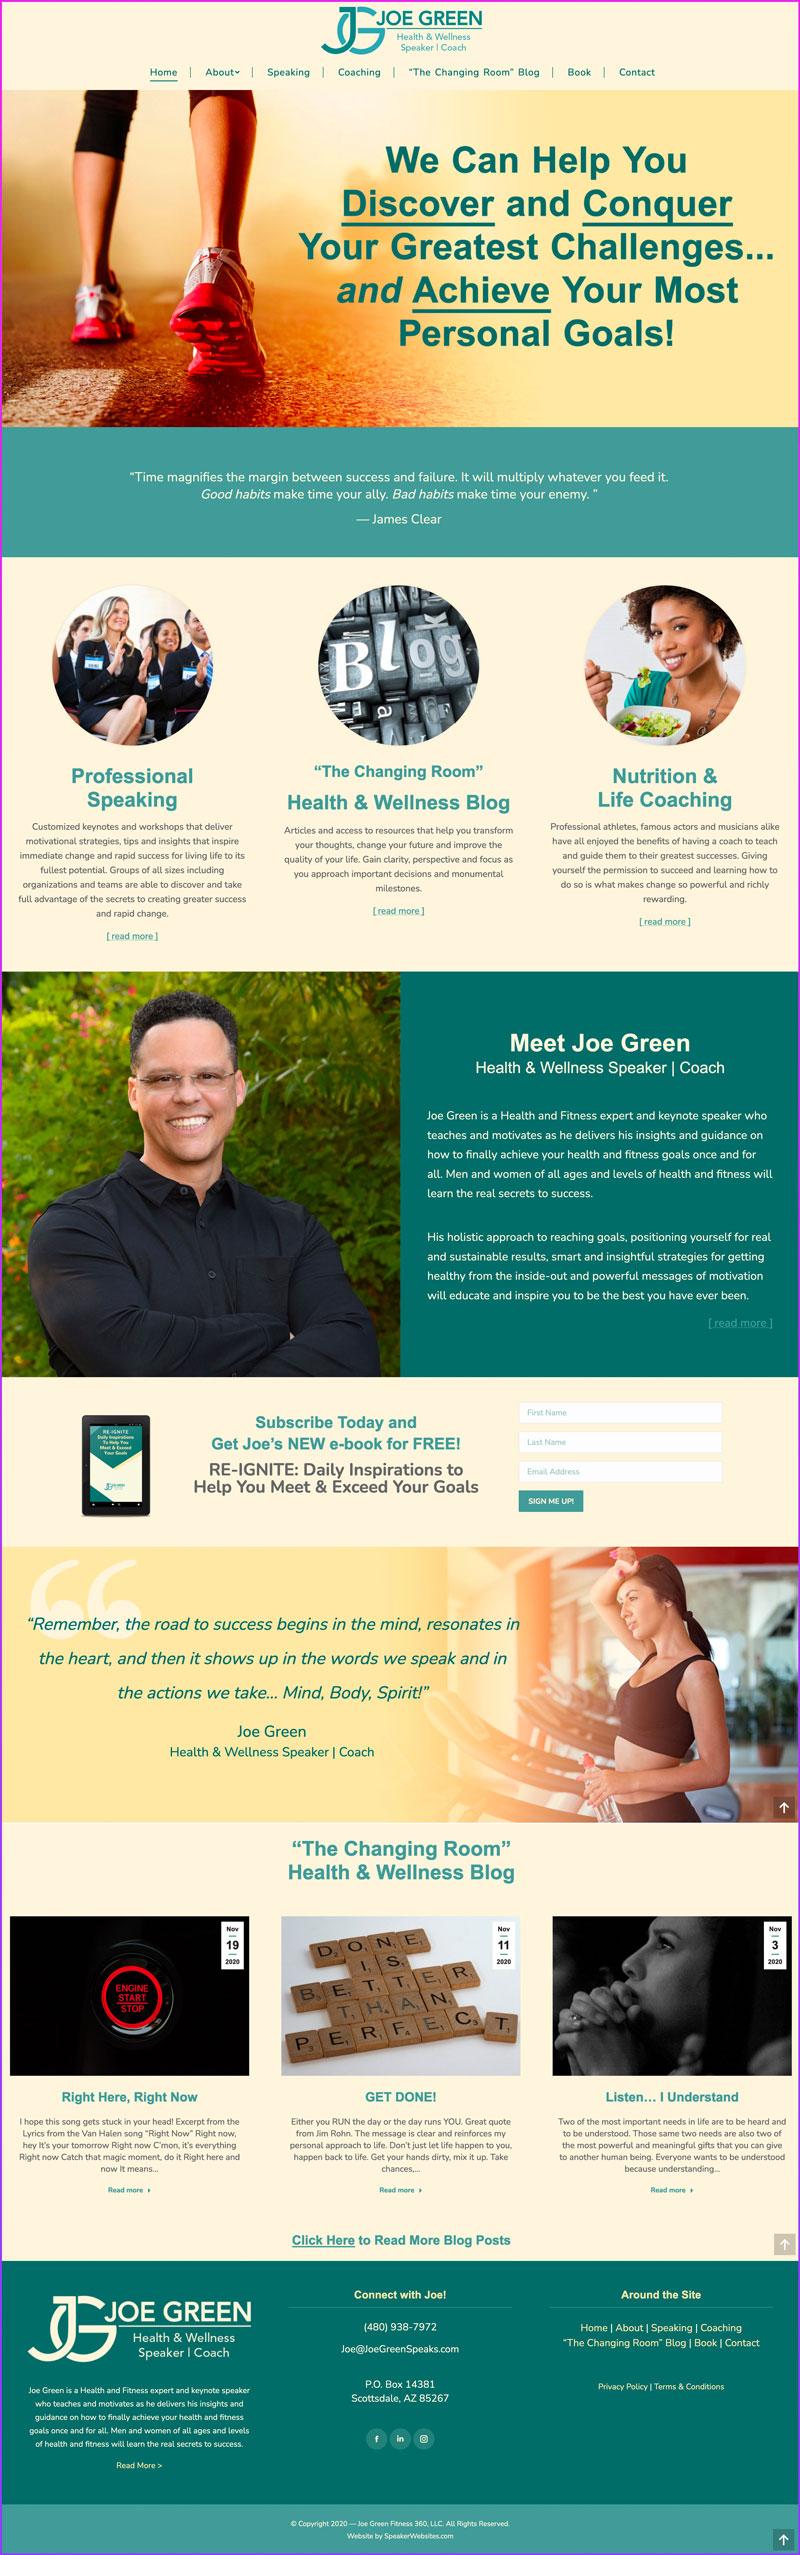 Joe Green ~ Health & Wellness Speaker & Coach